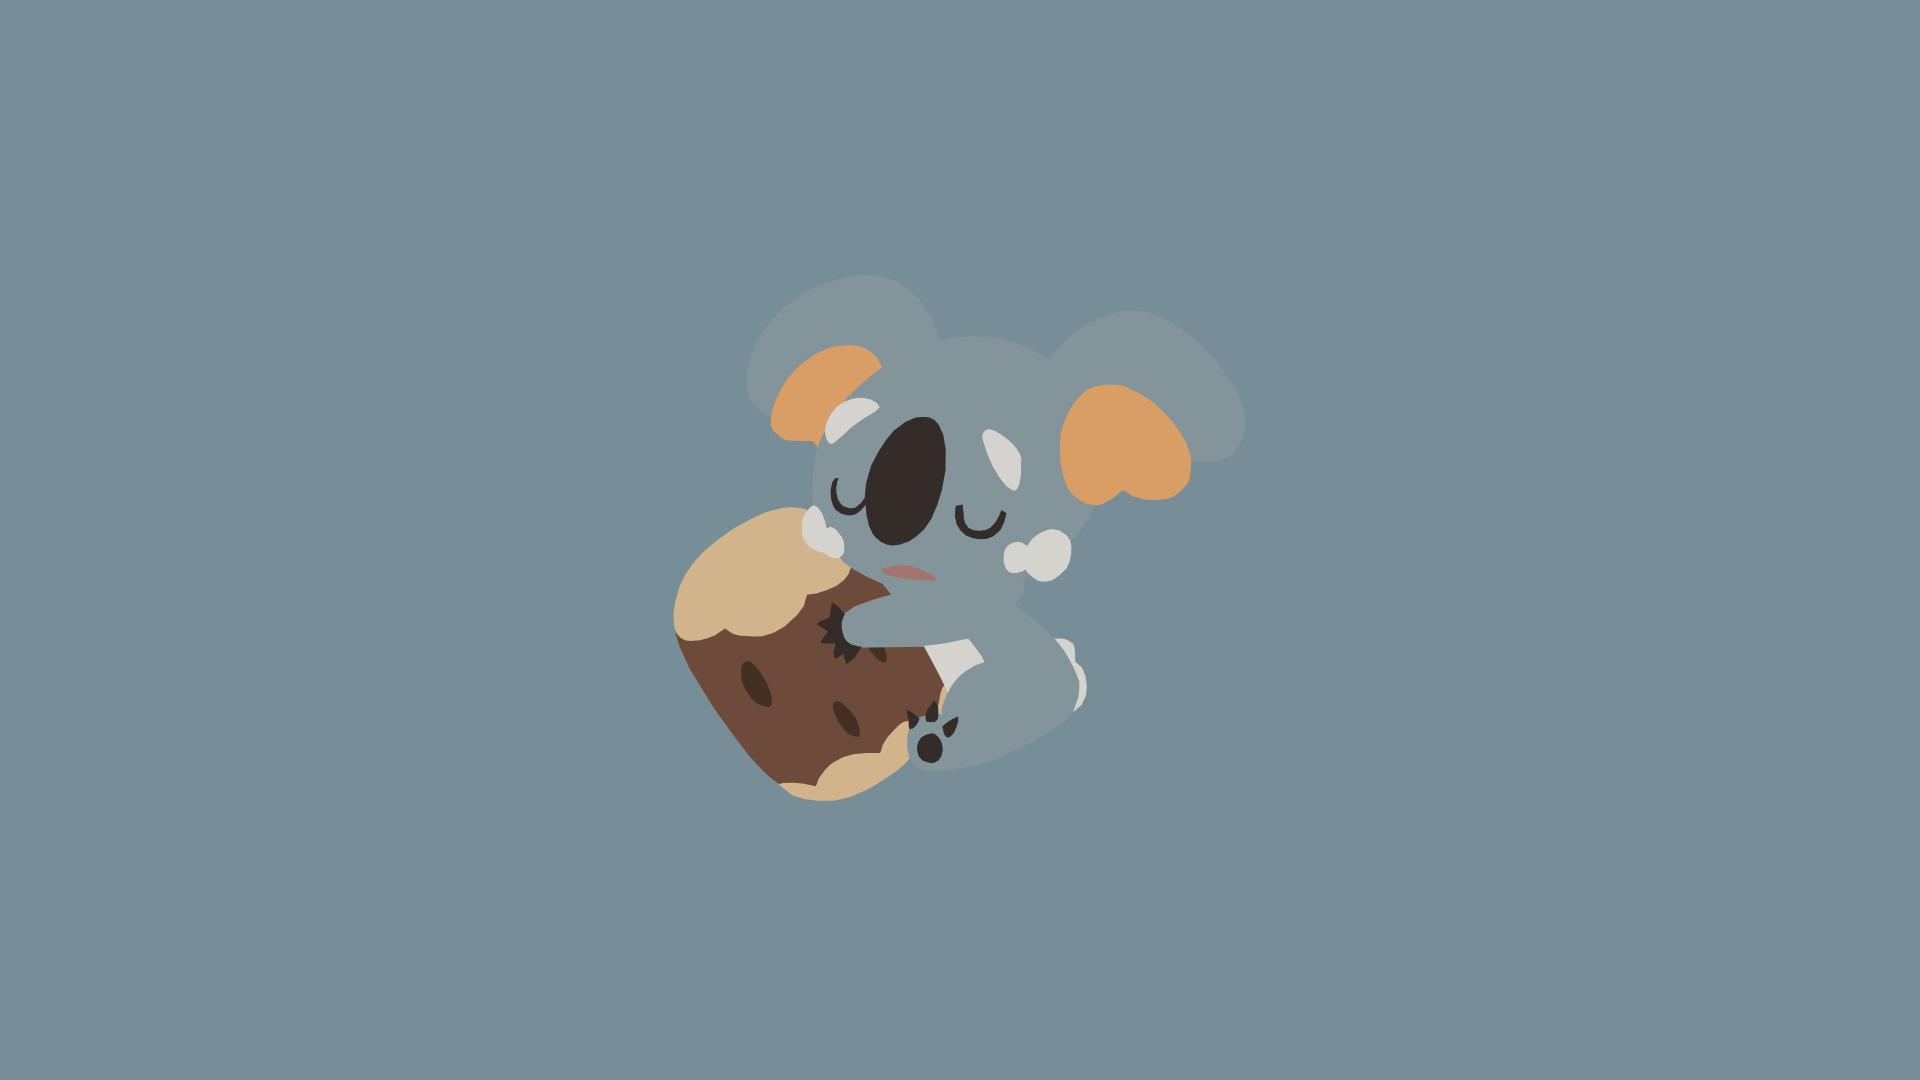 Good Wallpaper Koala Cartoon - minimalistic_wallpaper__komala___775__by_mardgeert-da5y0b3  Gallery_30516   .png